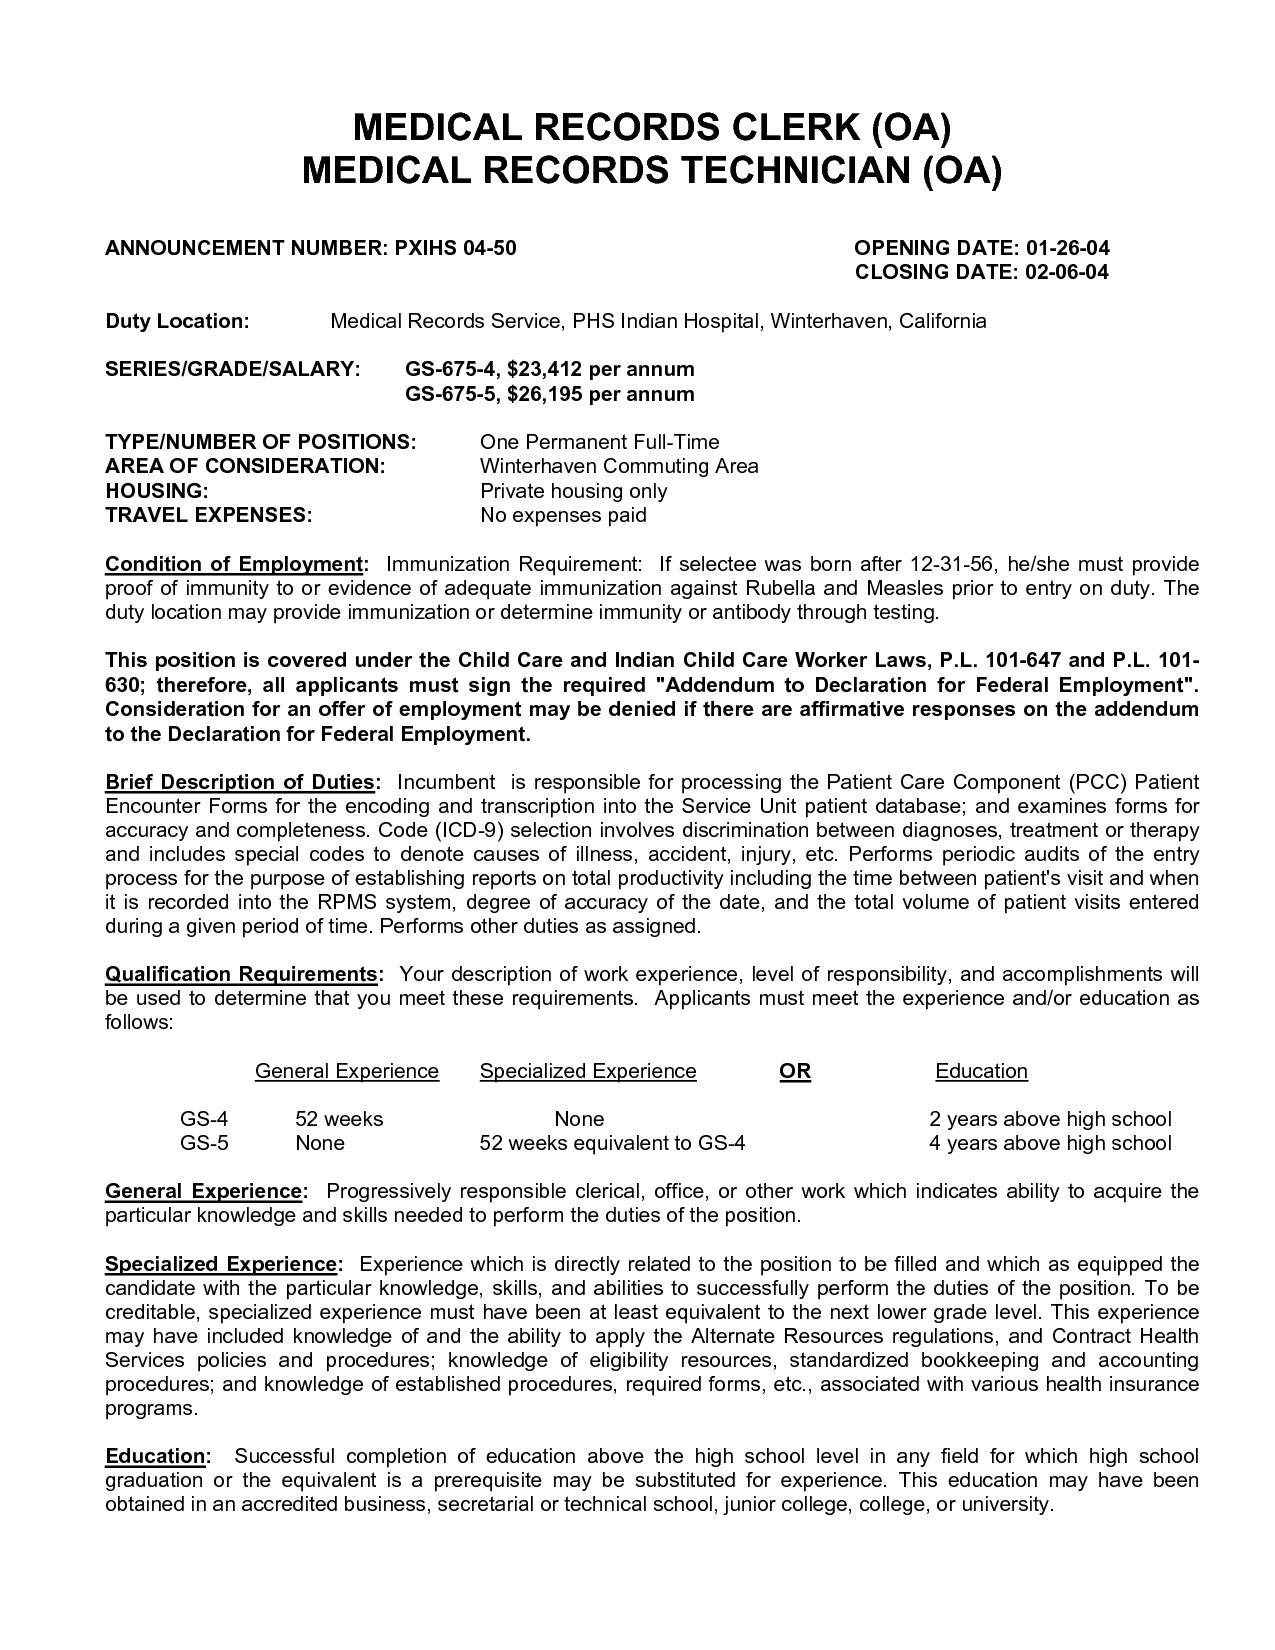 medical records clerk resume job description